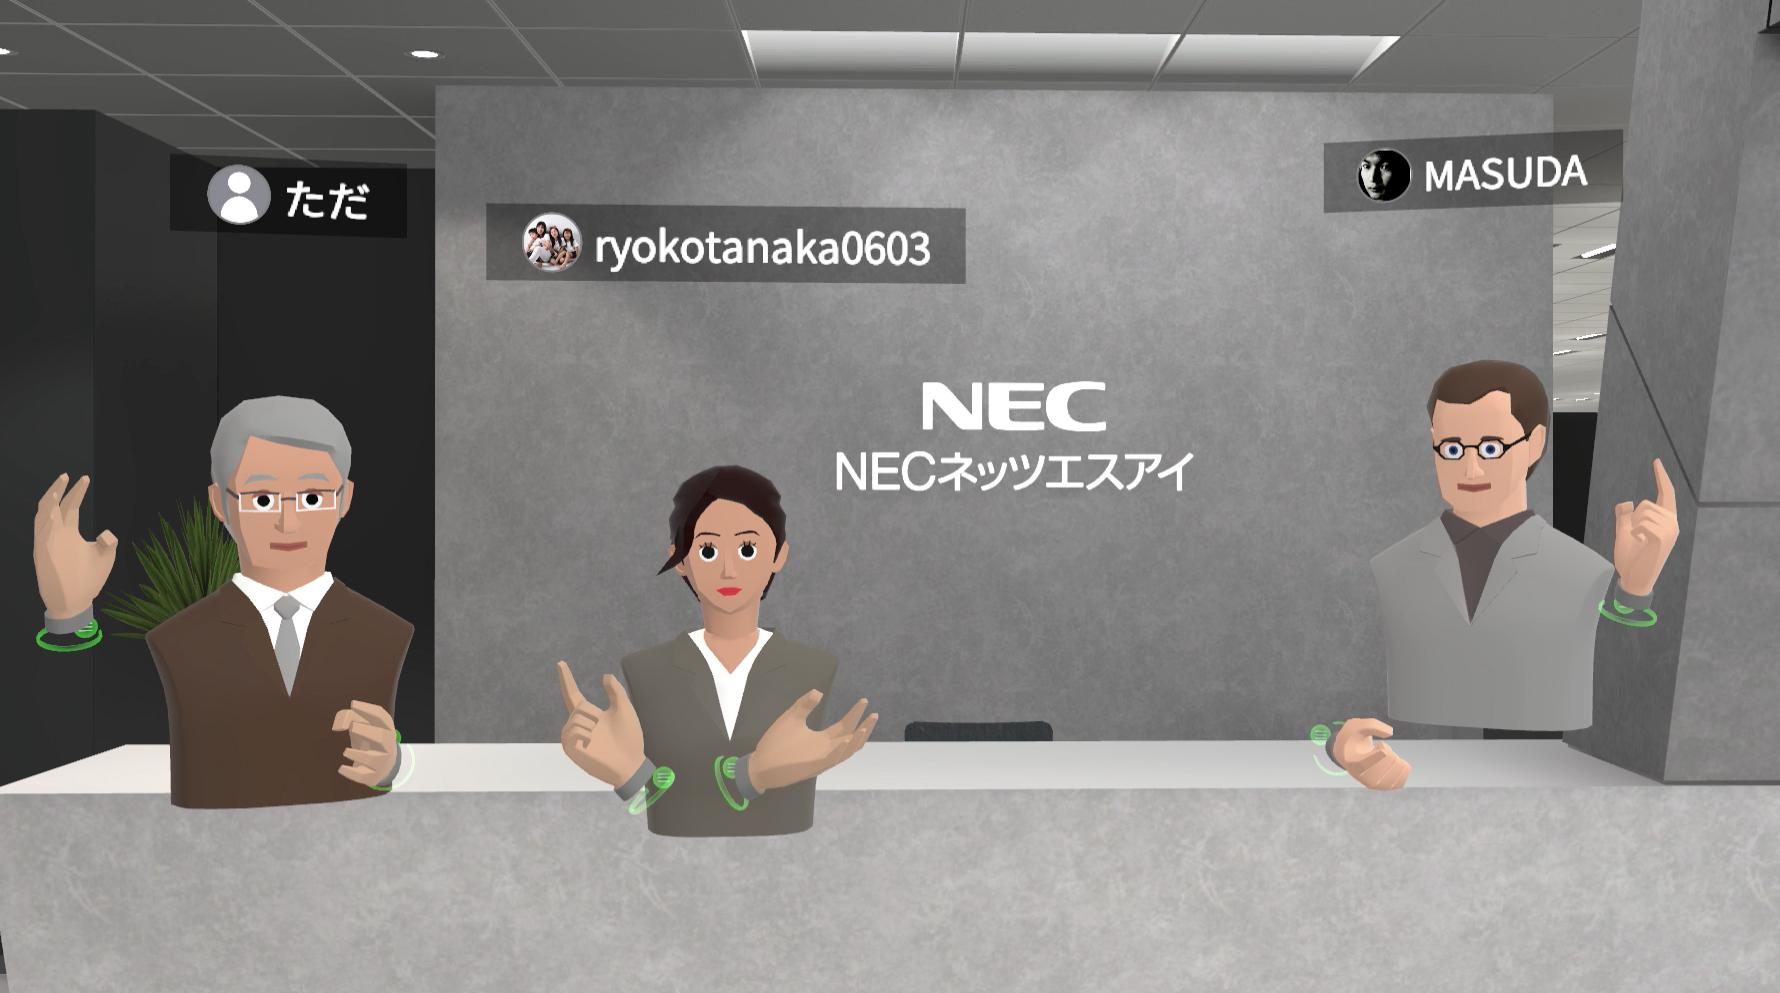 NECネッツエスアイ DXビジネス推進本部の多田氏・田中氏・増田氏